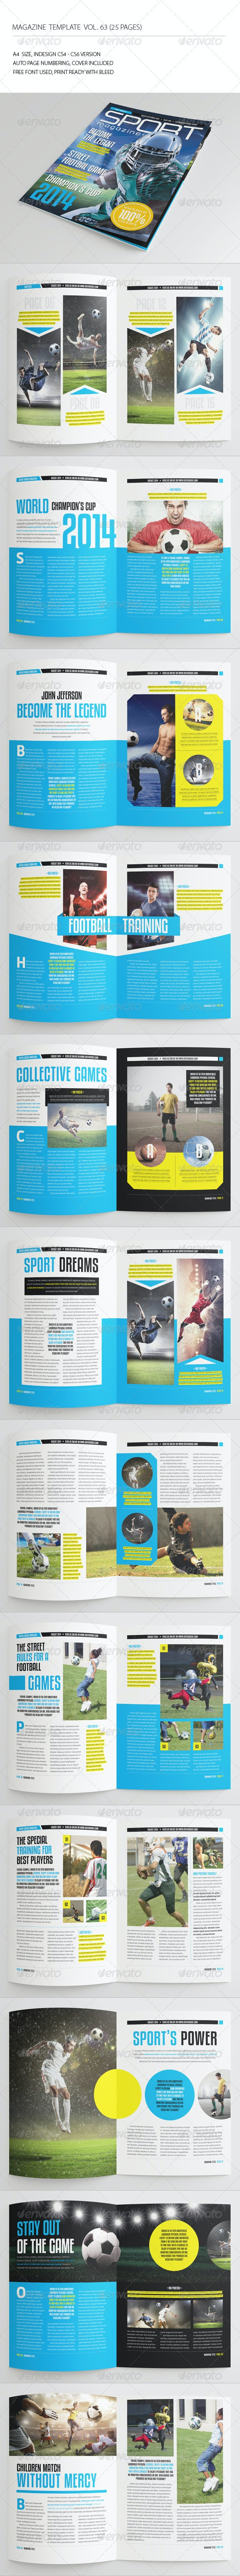 25 Pages Sport Magazine Vol63 - Magazines Print Templates